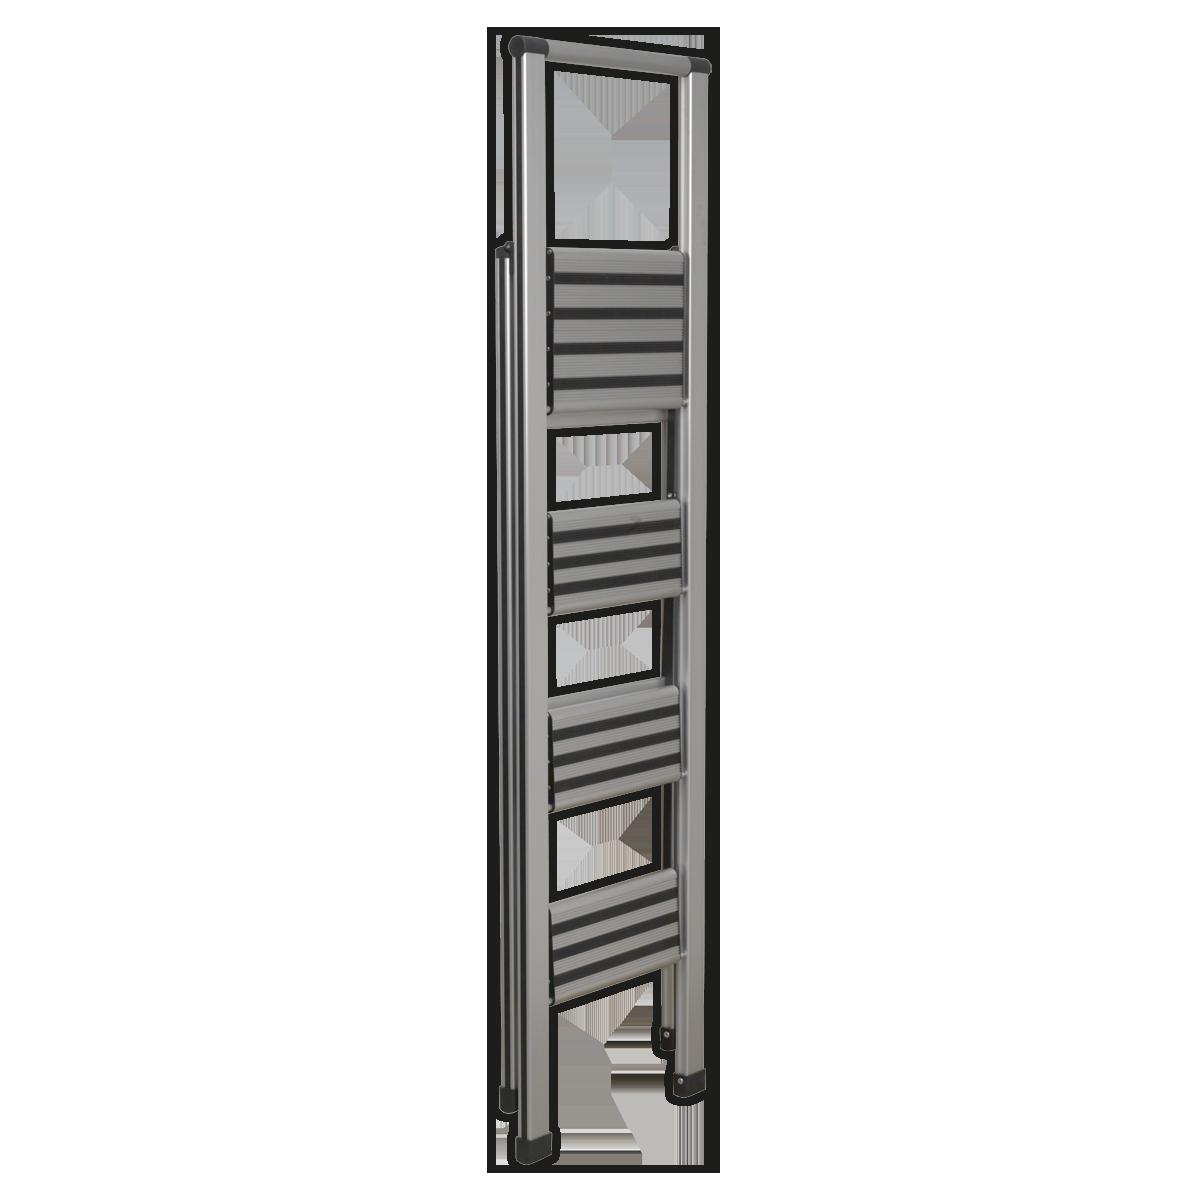 Aluminium Professional Folding Step Ladder 4-Step 150kg Capacity